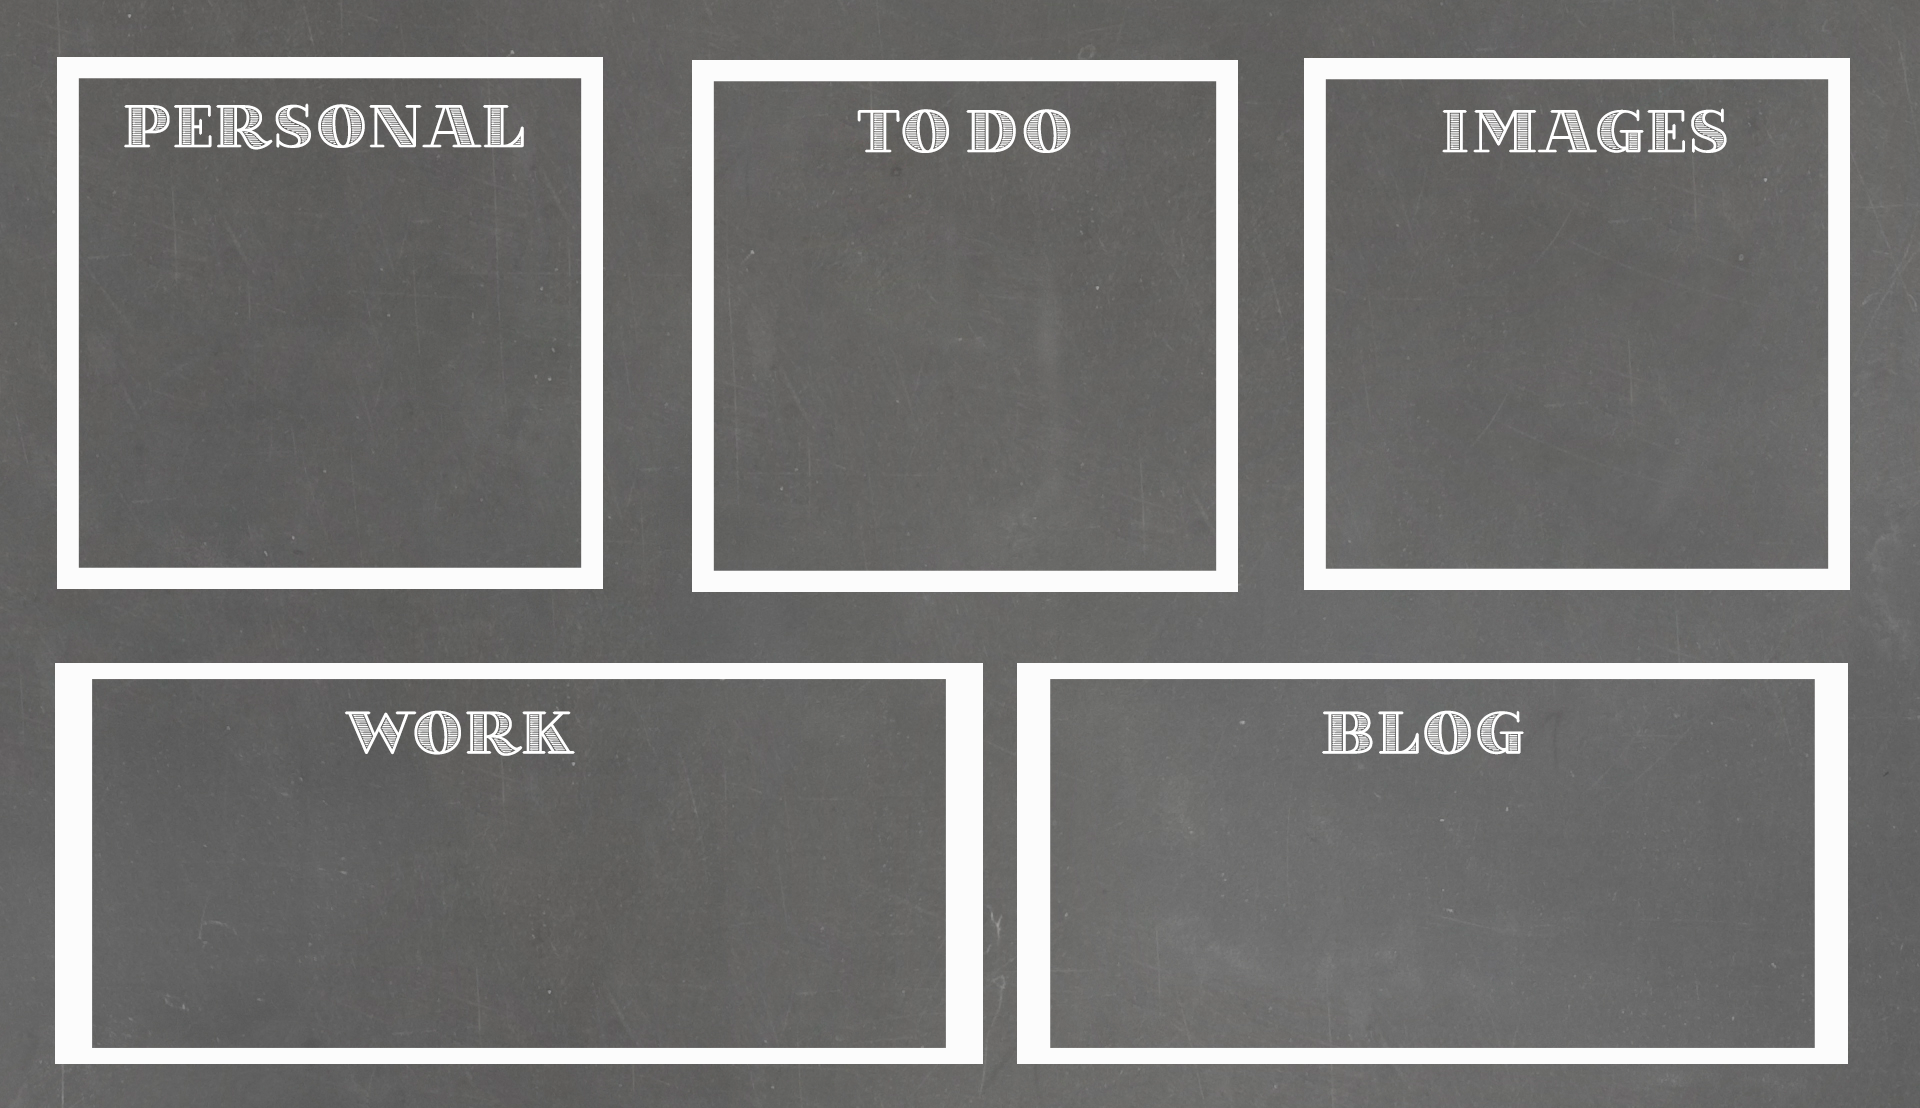 Chalkboard Desktop Organizer Wallpaper Background Desktop Organization Desktop Wallpaper Organizer Chic Organization